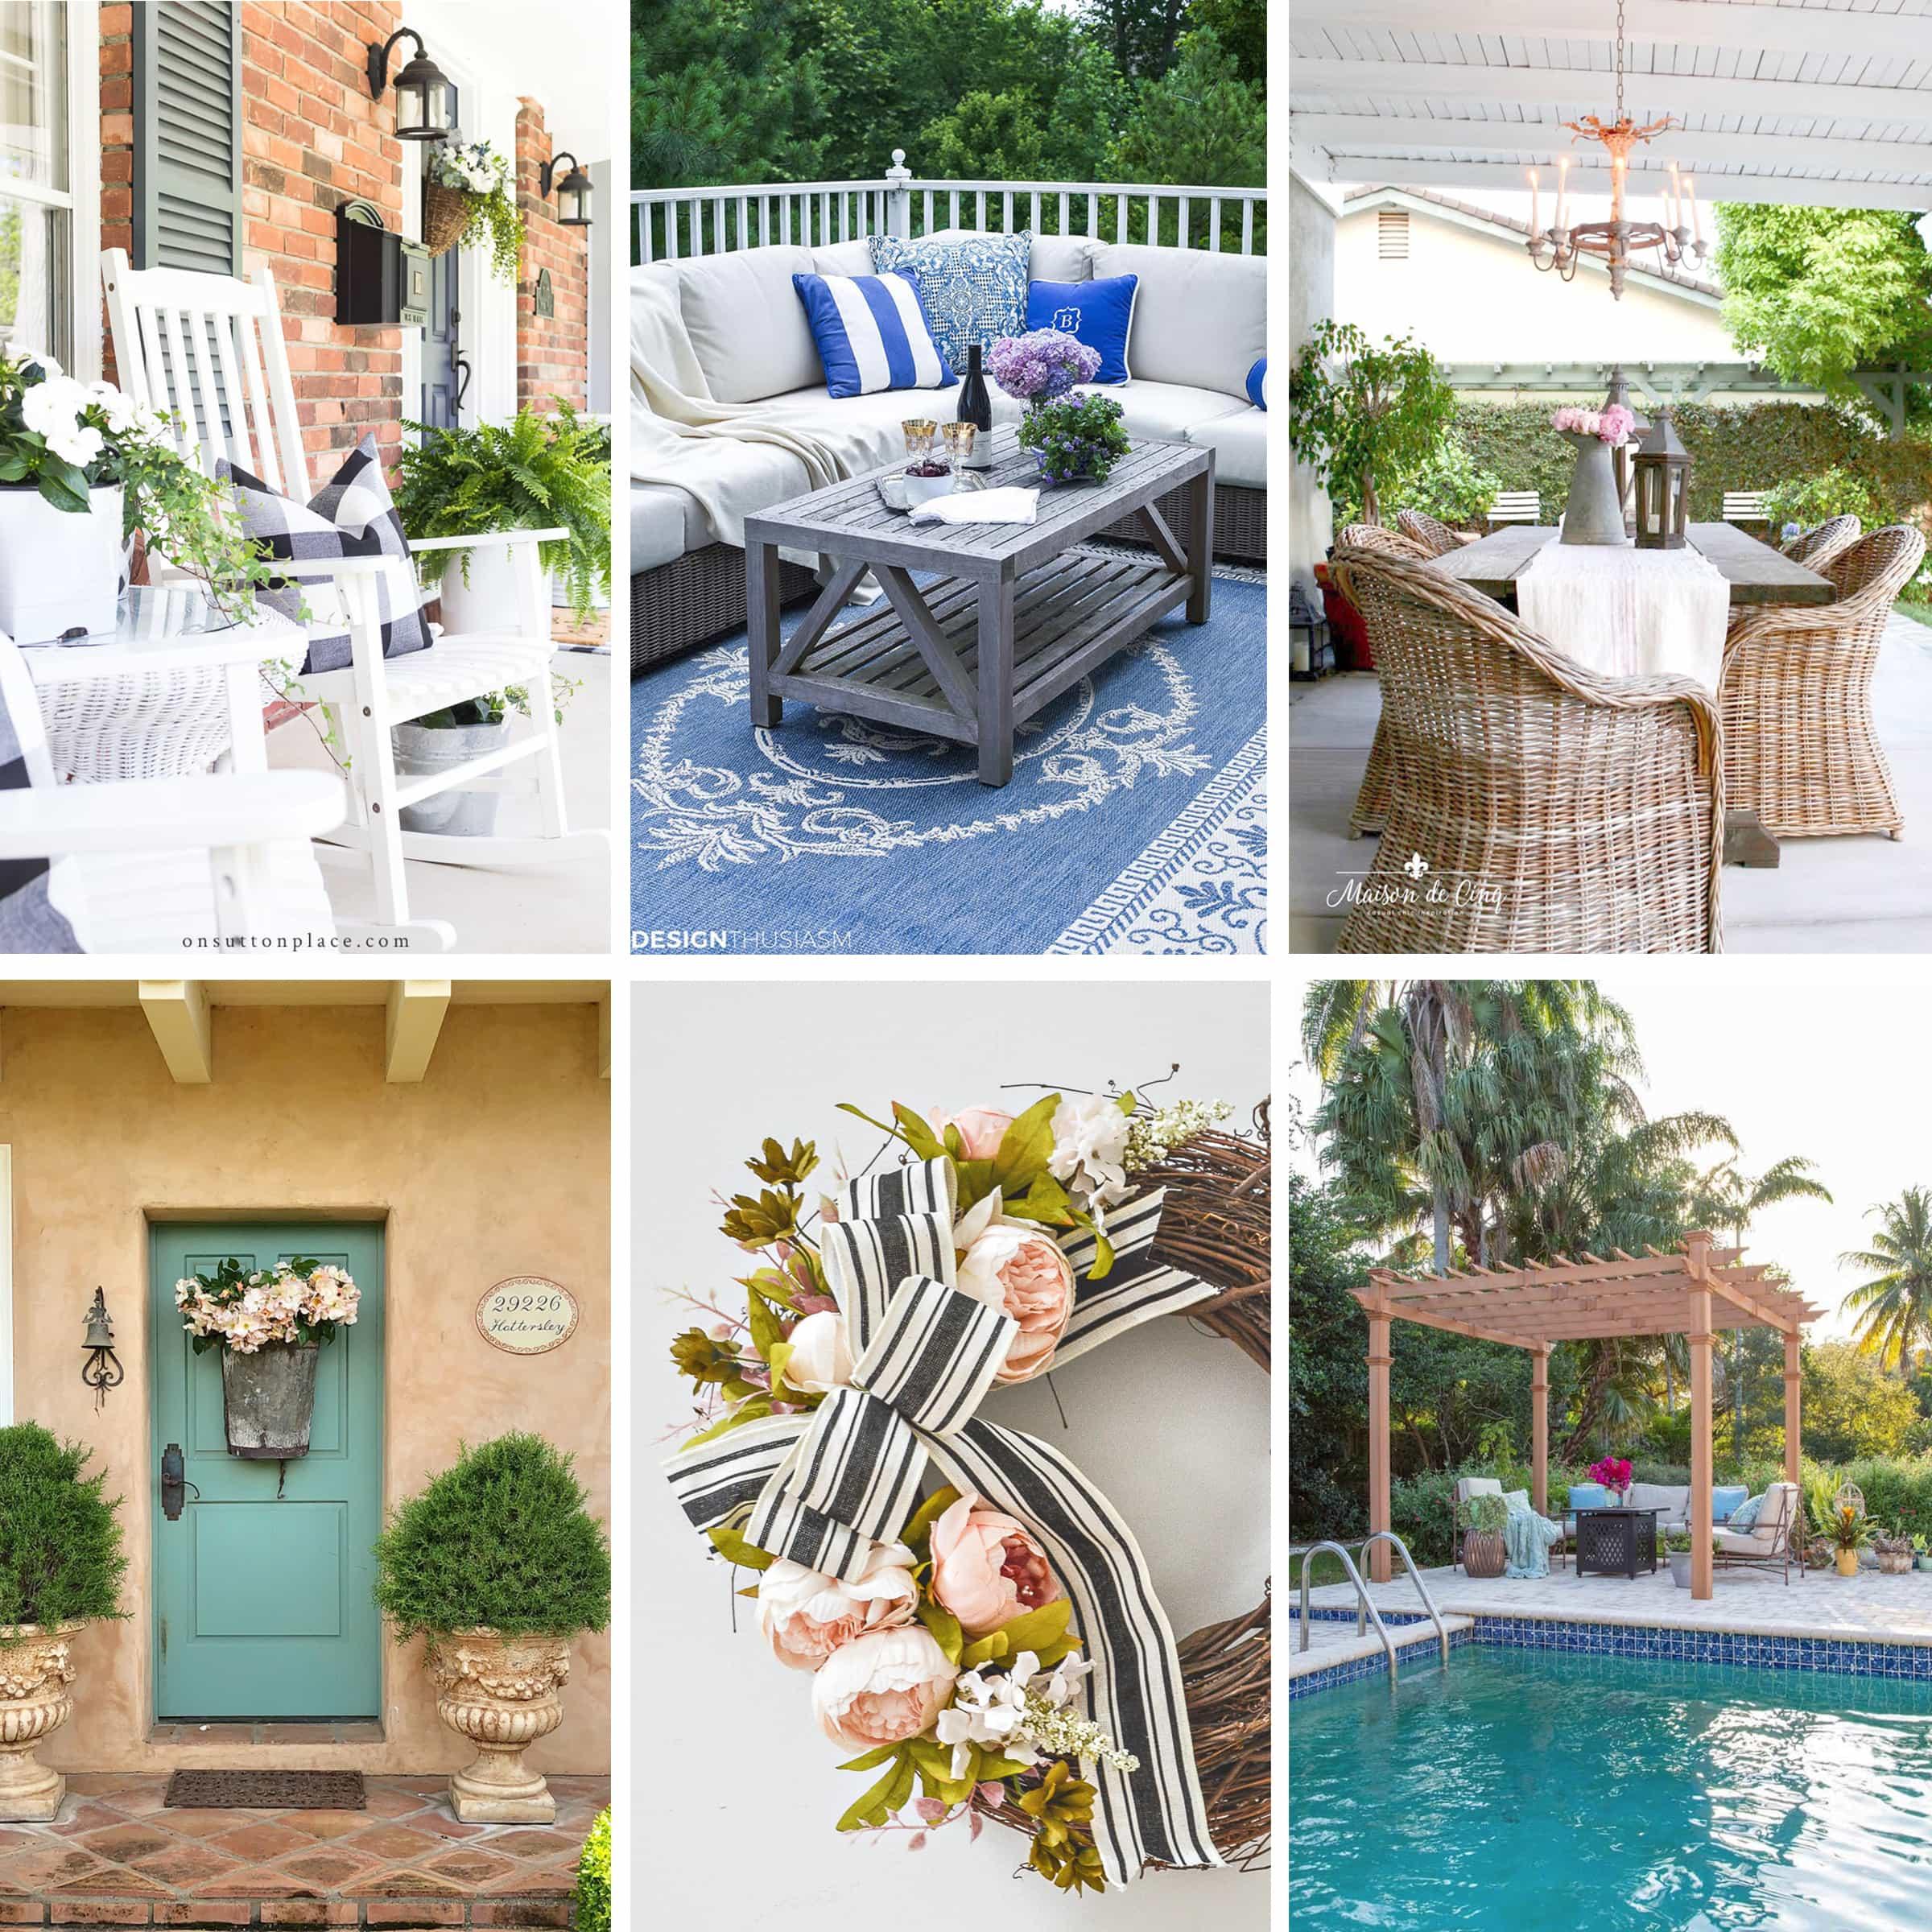 cozy outdoor decor ideas 6 bloggers